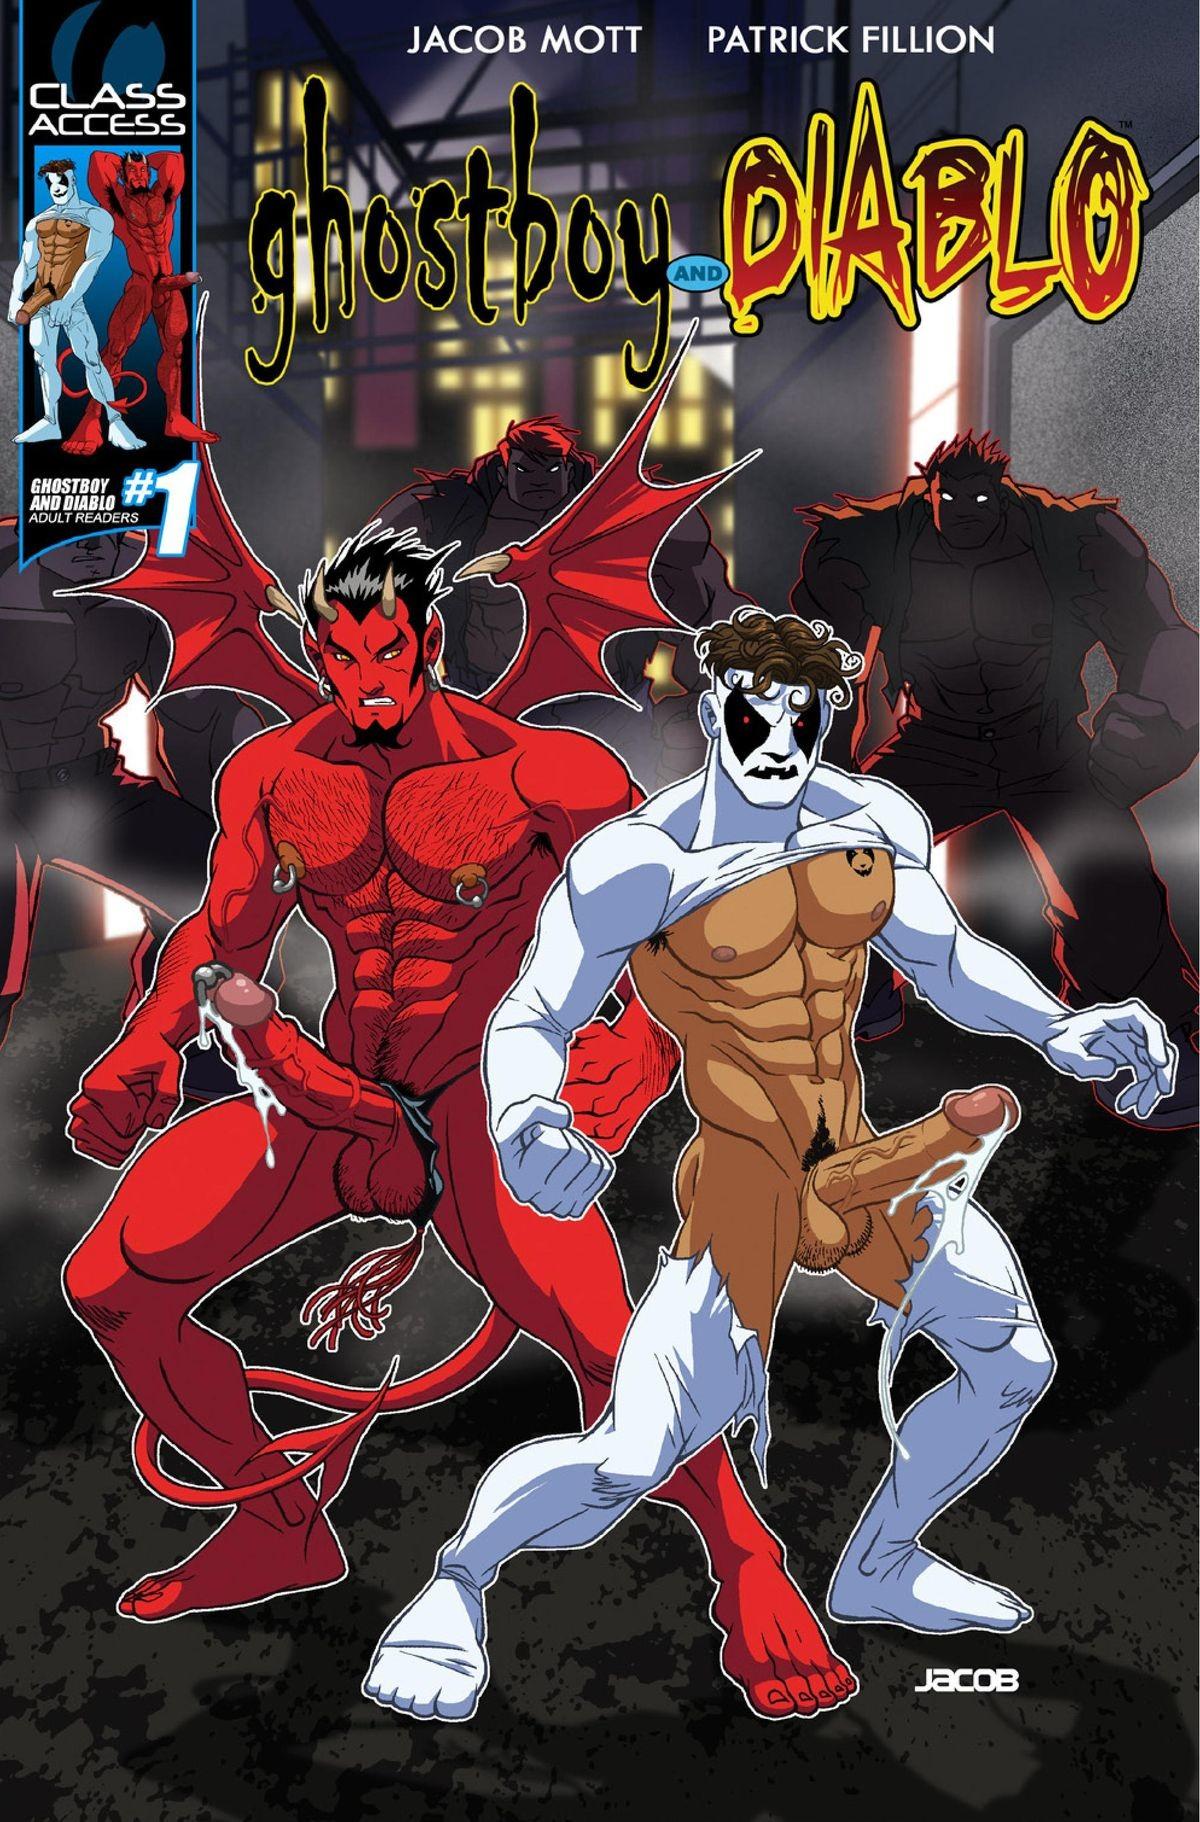 Ghostboy & Diablo 01